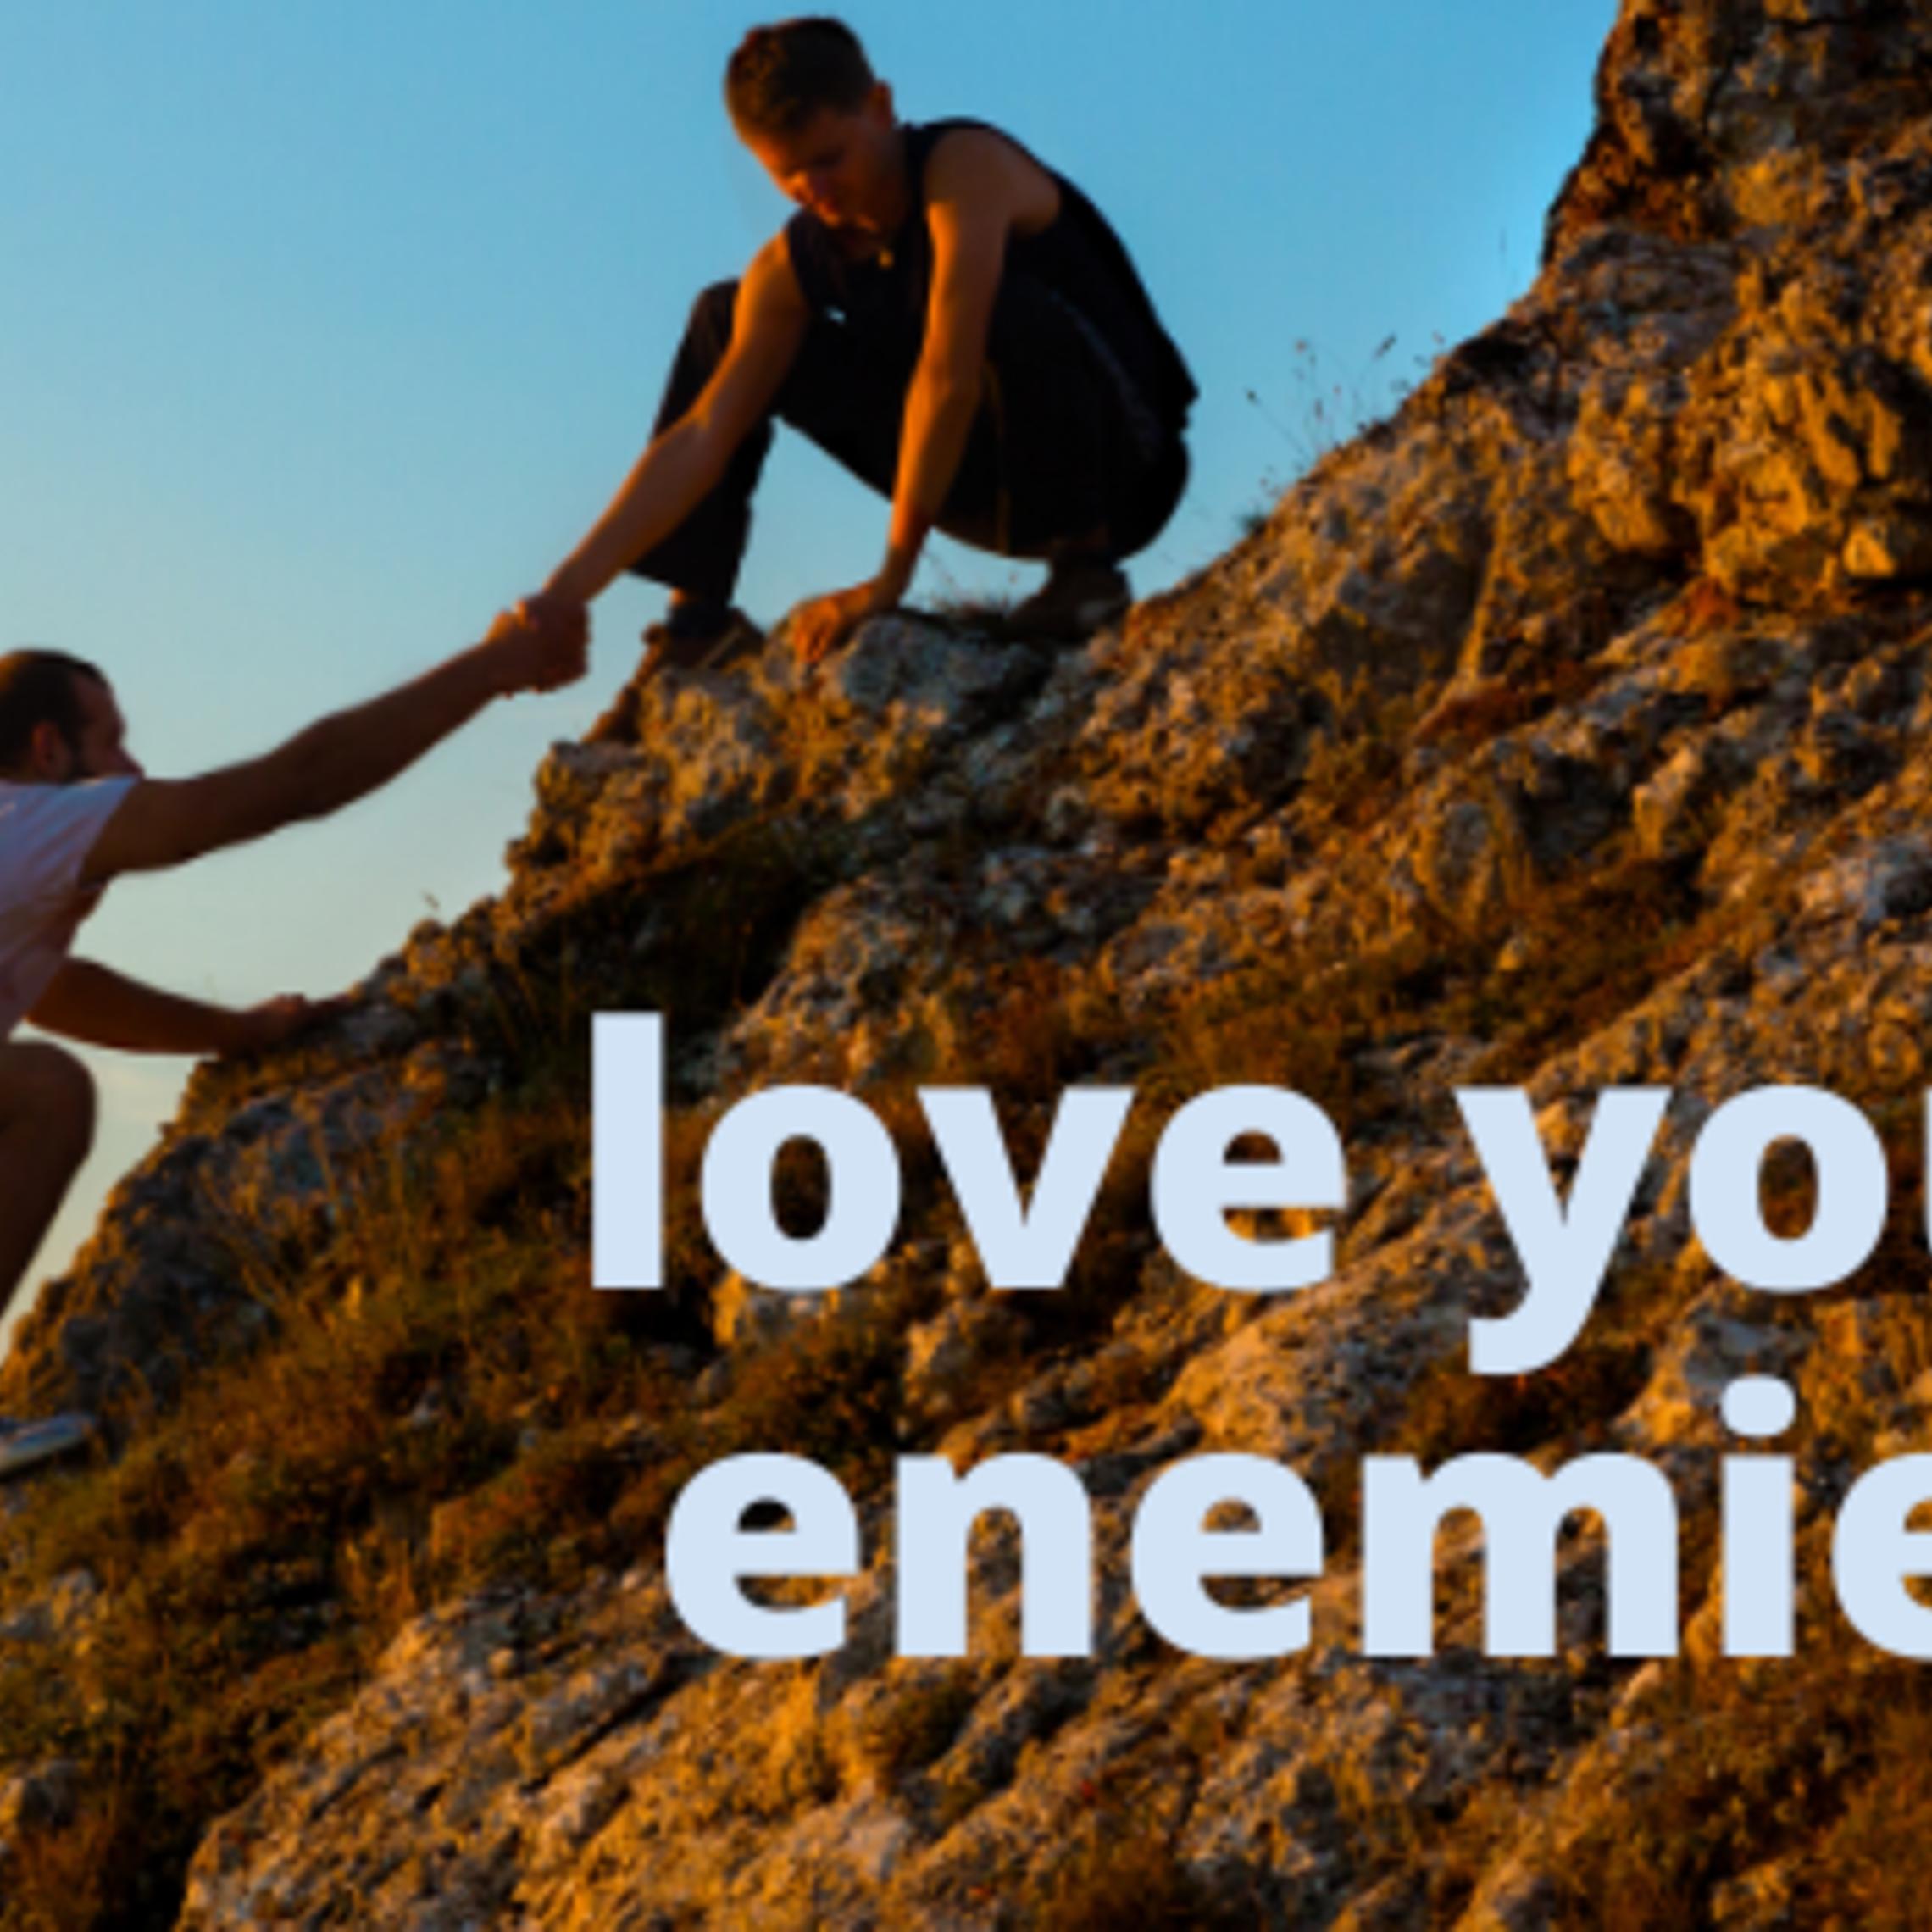 Copy Of Love Your Enemies